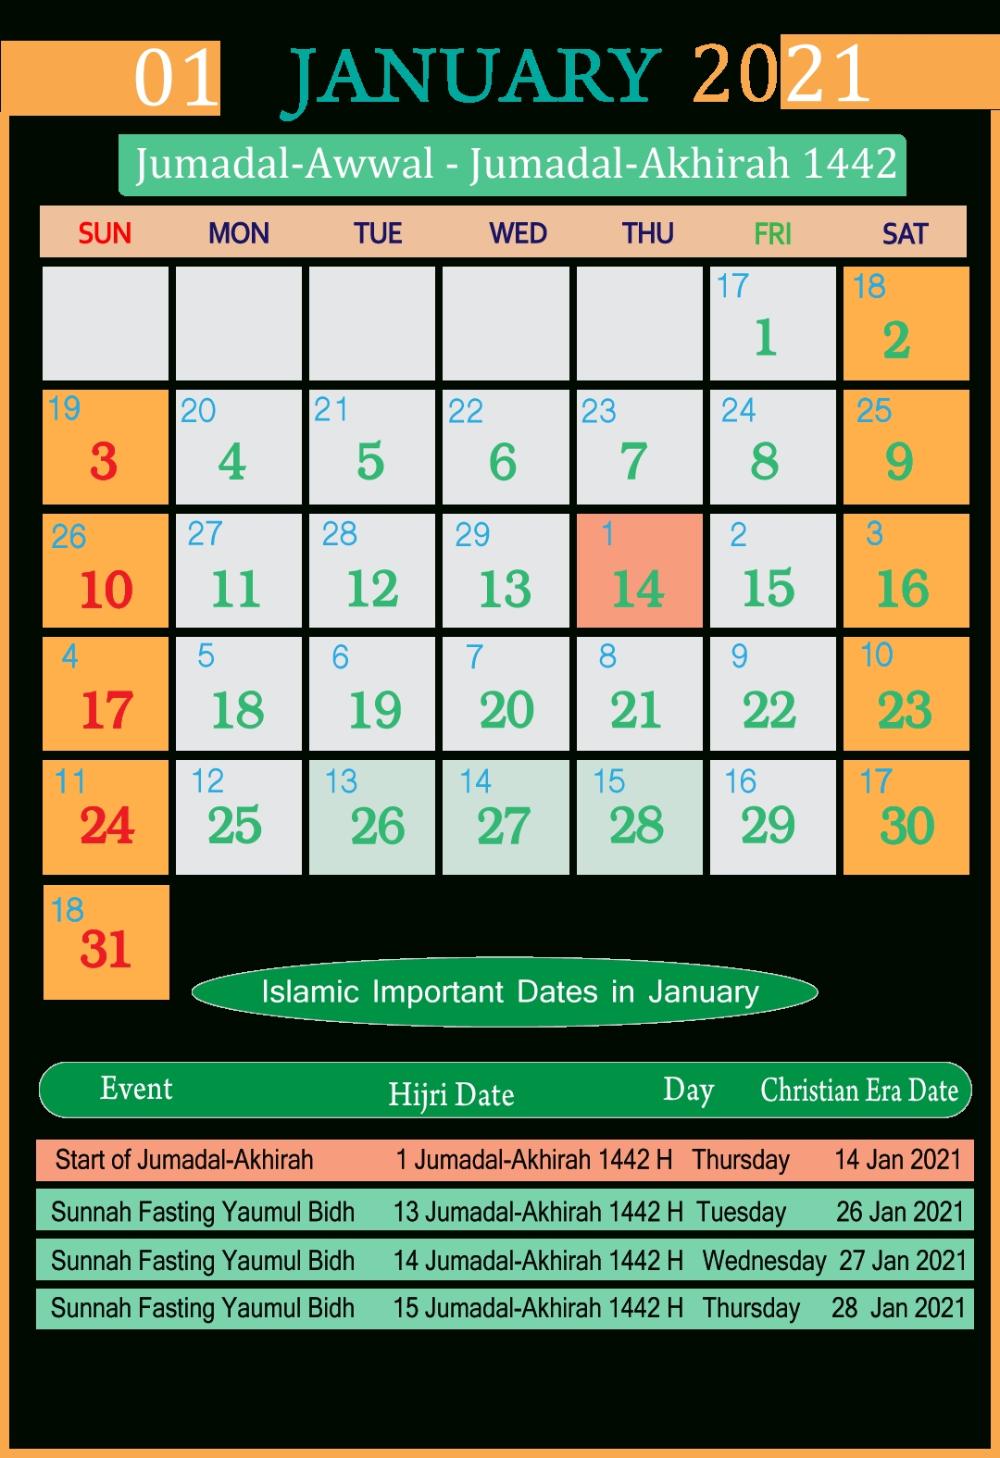 Islamic Calendar 2021 Pdf Free Seg Make It Calendar Printables Calender Print Calendar